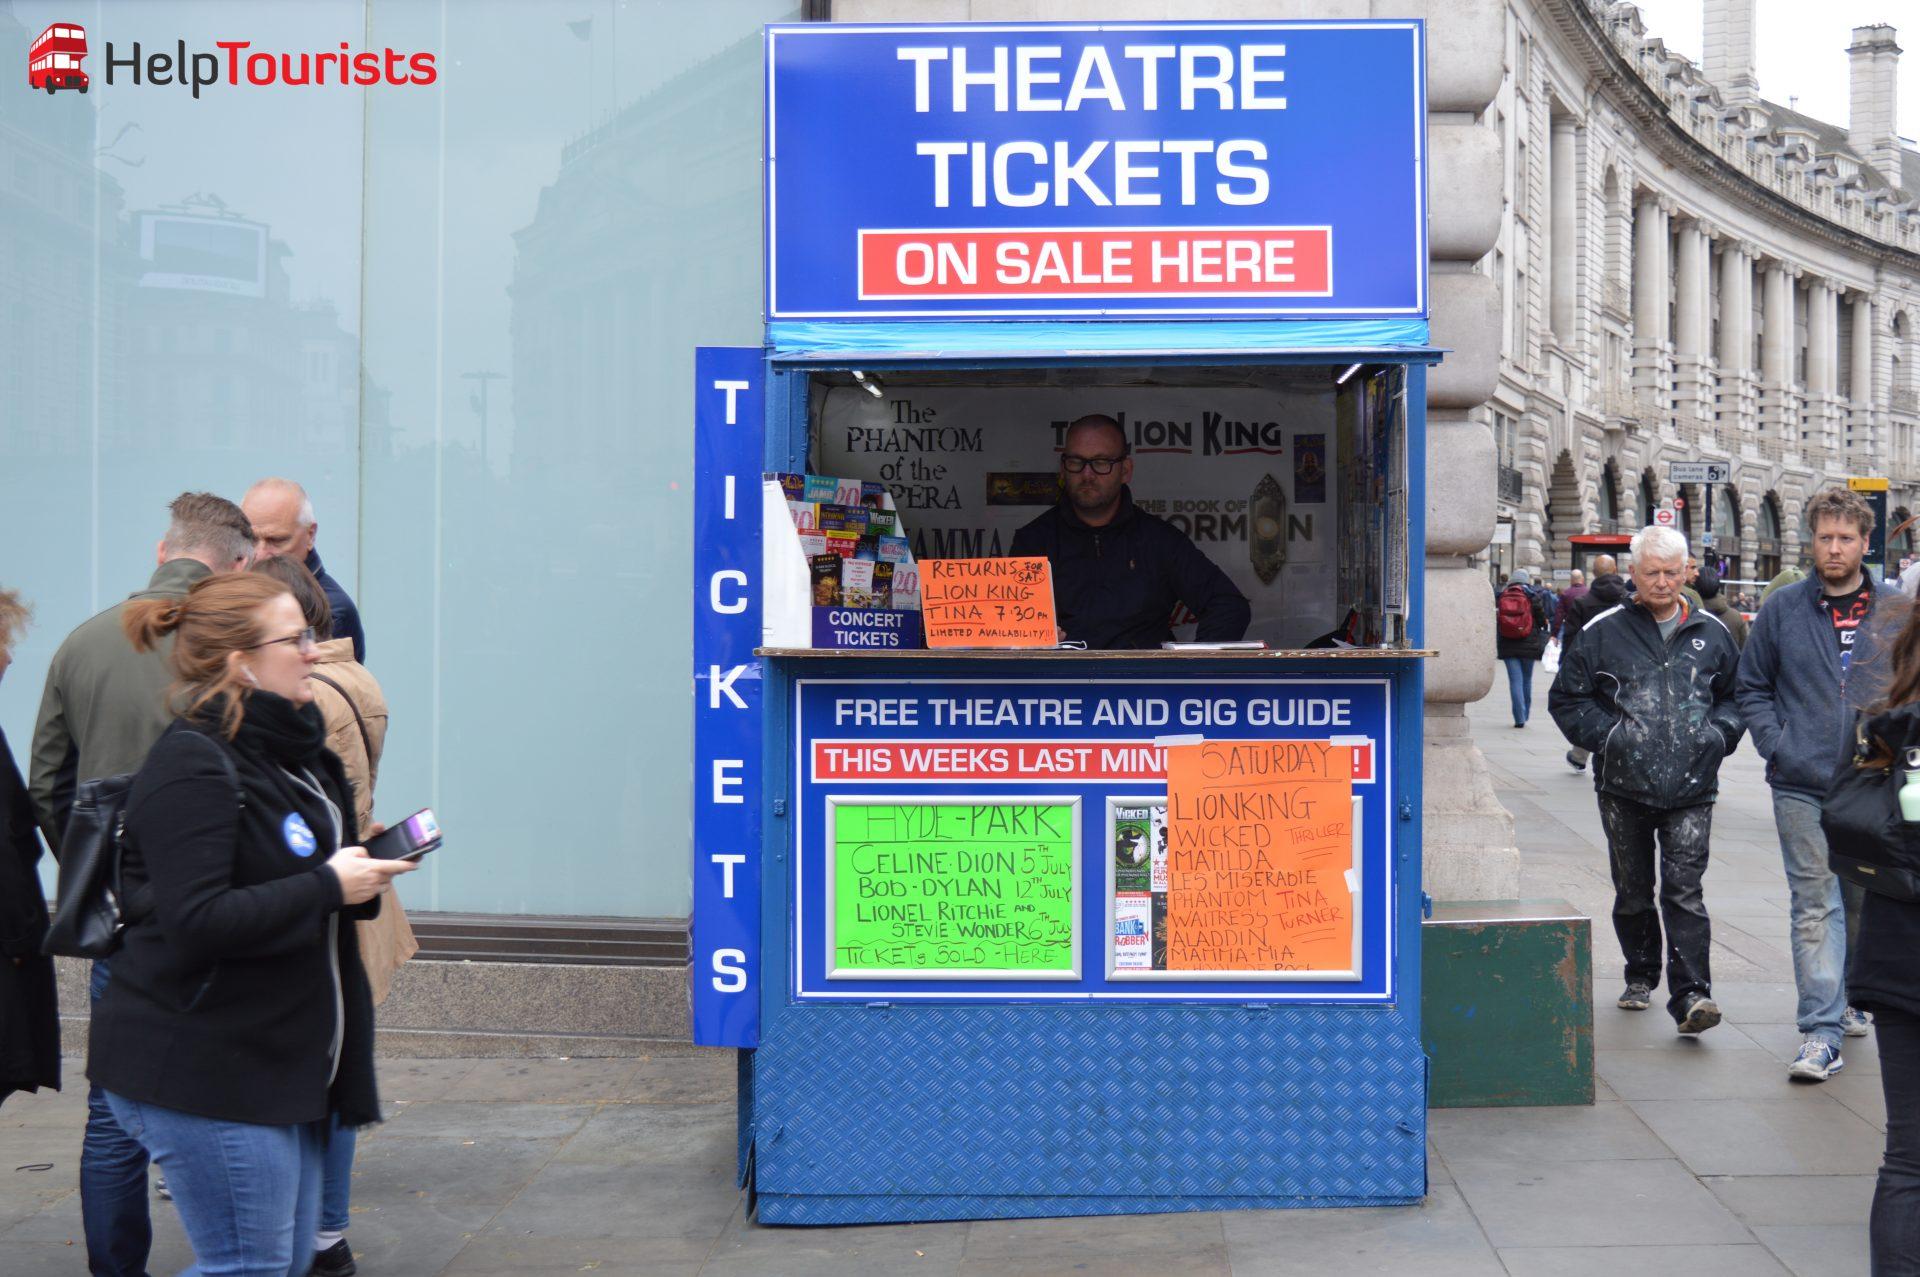 Piccadilly Circus Theater Karten kaufen